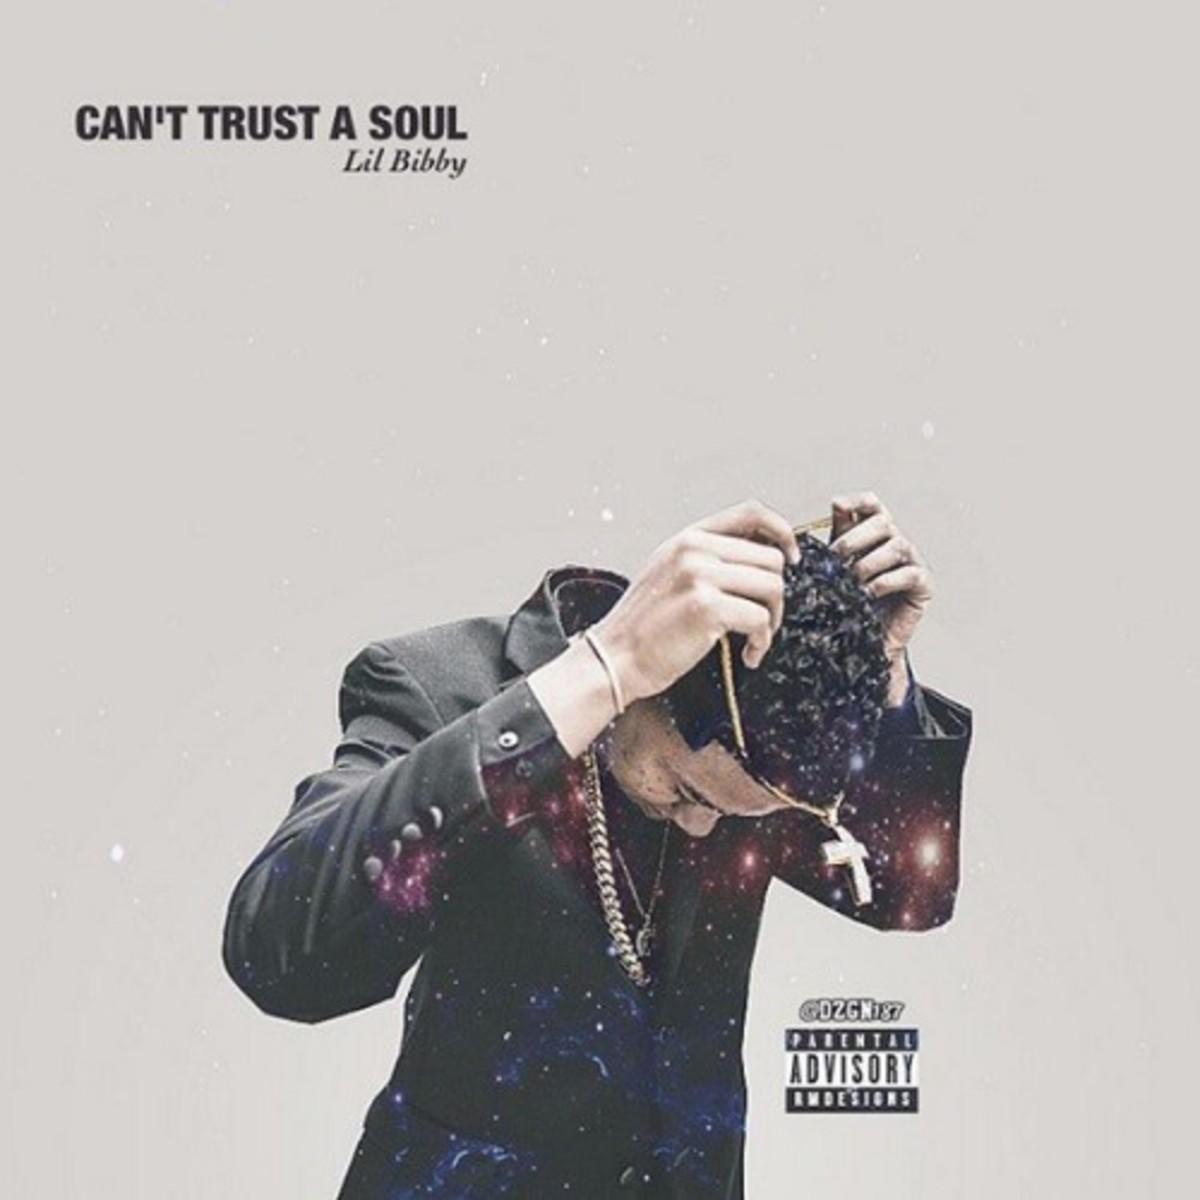 lil-bibby-cant-trust-a-soul.jpg